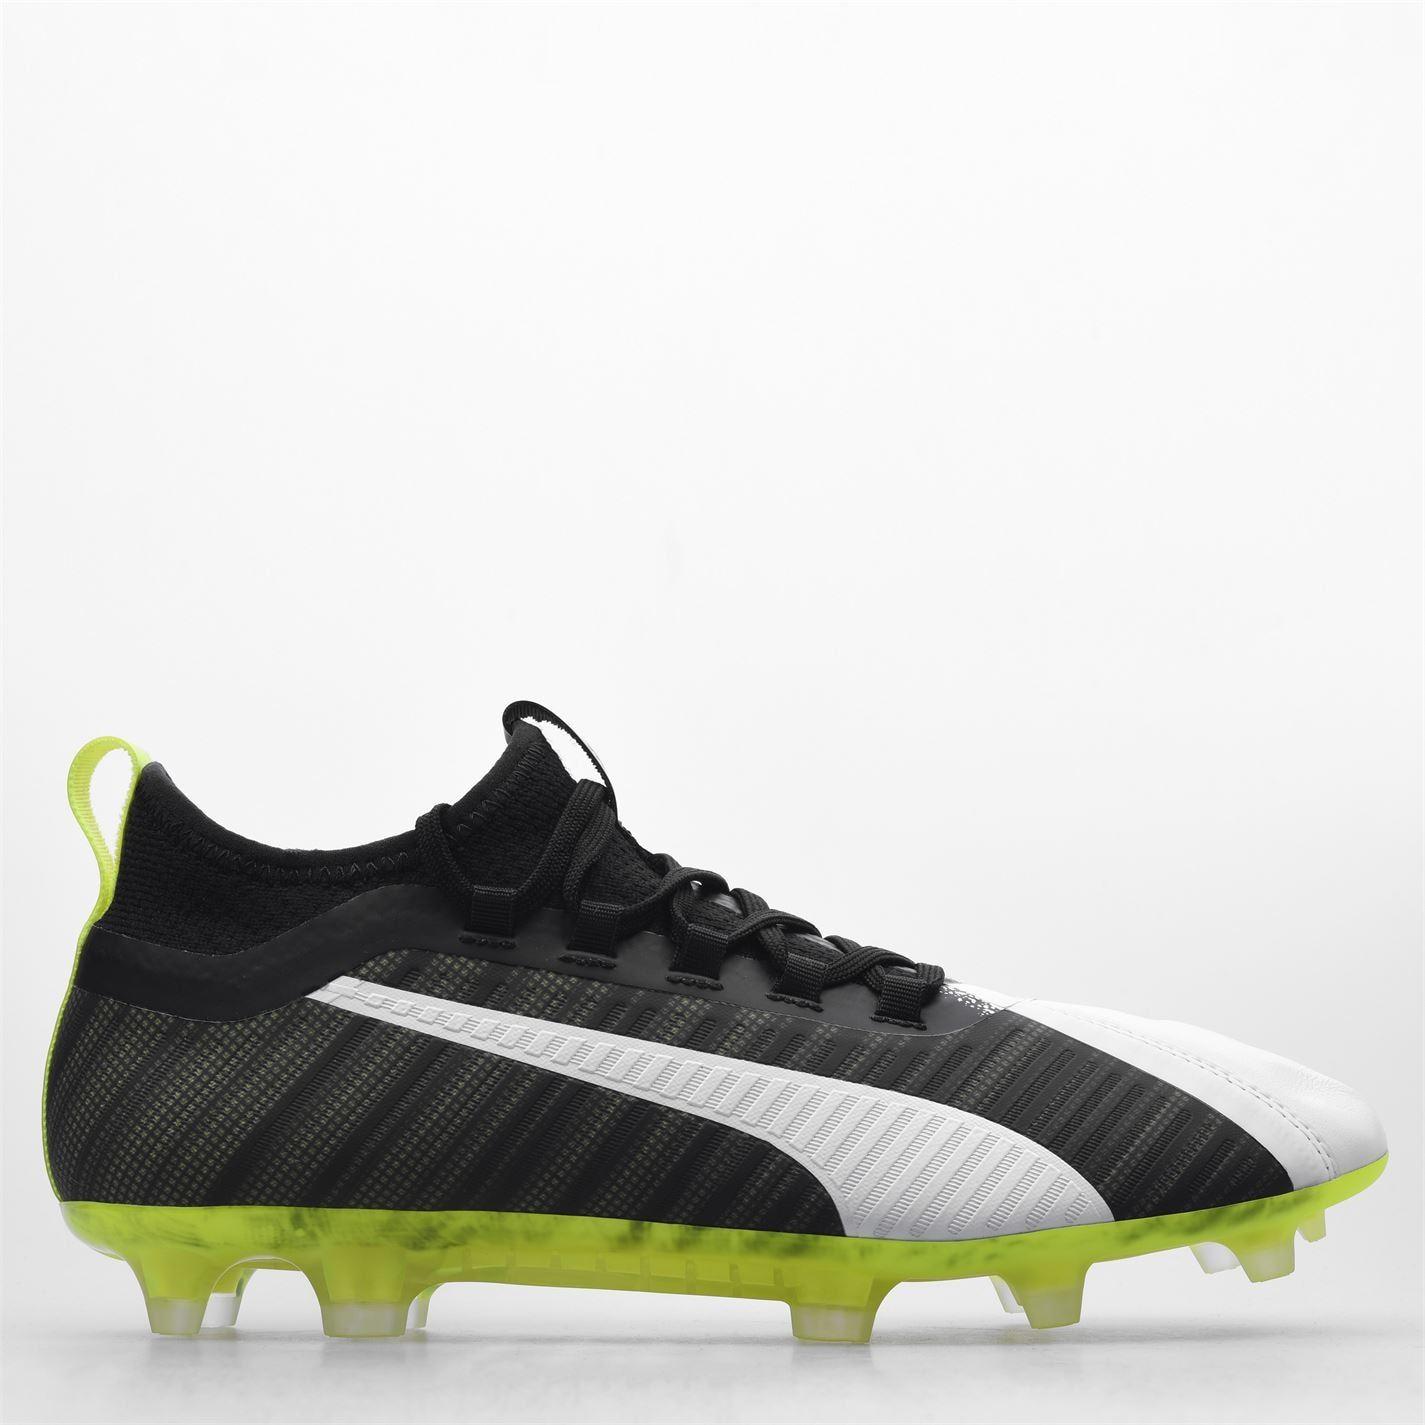 miniature 15 - Puma-5-2-FG-Firm-Ground-Football-Bottes-Homme-Chaussures-De-Foot-Crampons-Baskets